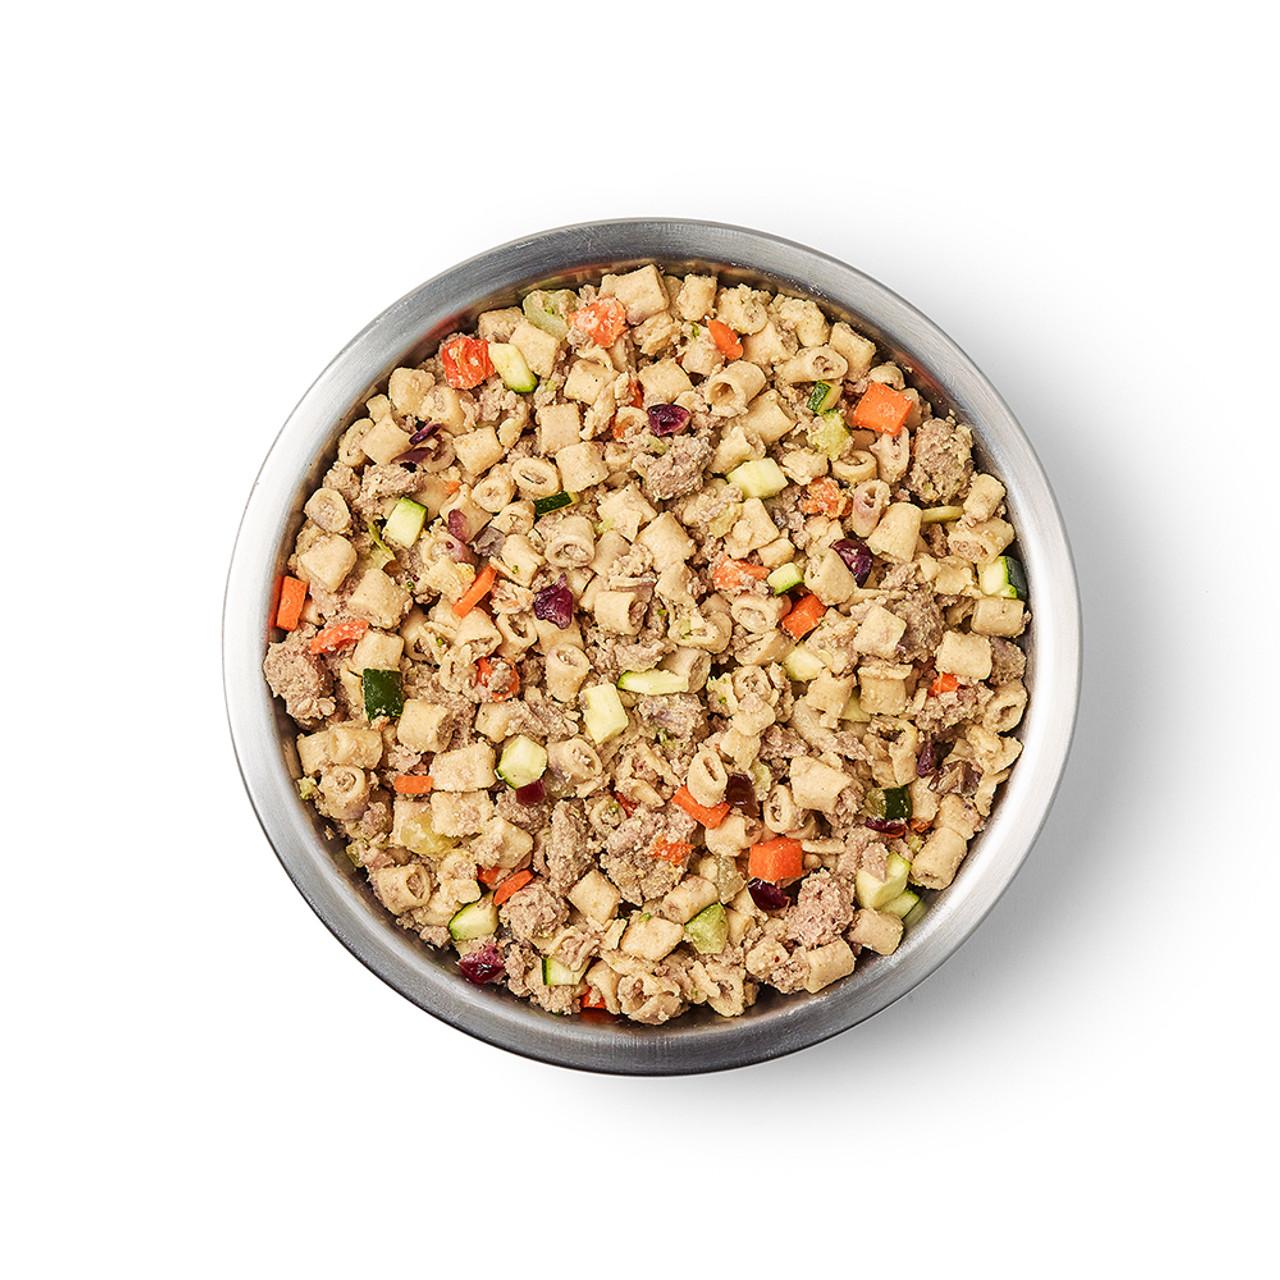 JustFoodForDogs Turkey & Whole Wheat Macaroni Frozen Cooked Dog Food